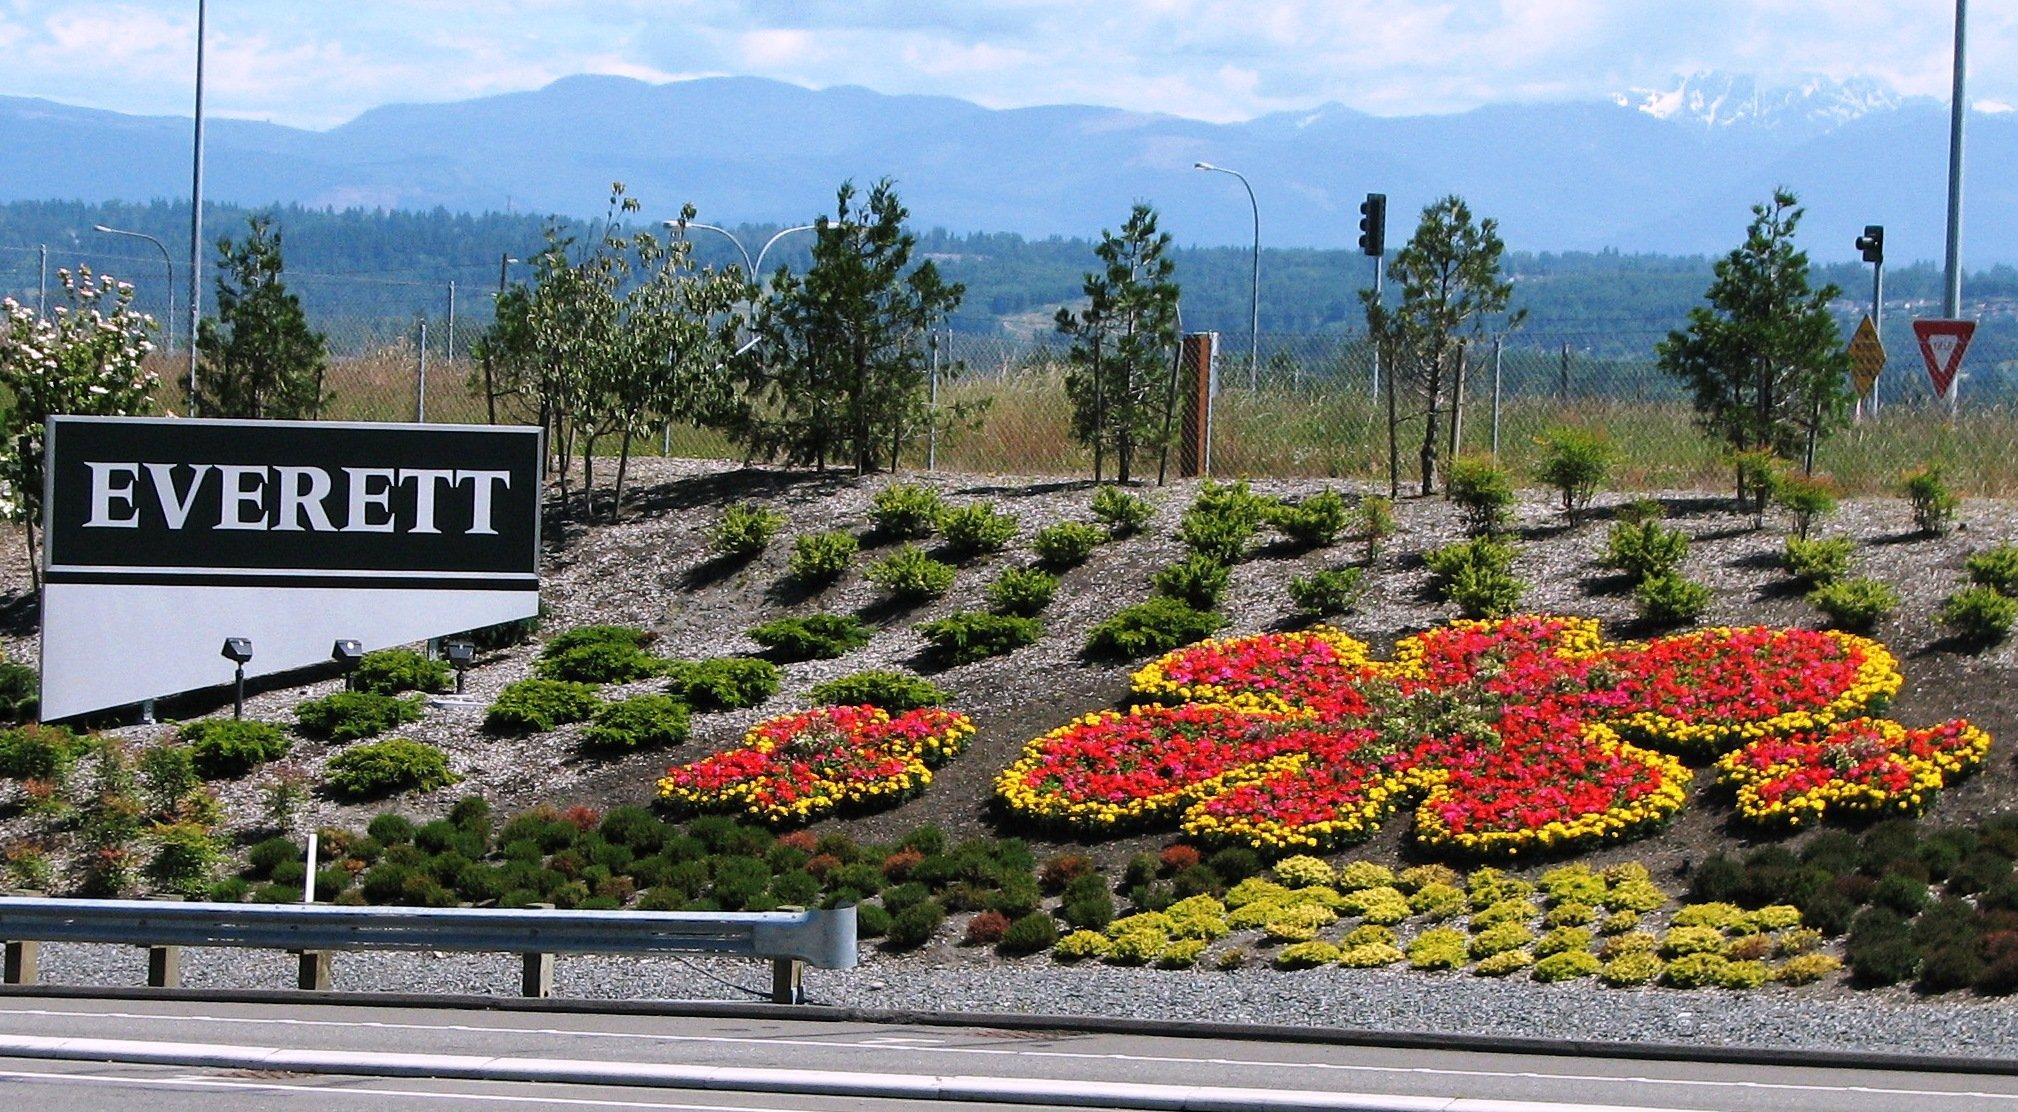 Town of Everett, WA